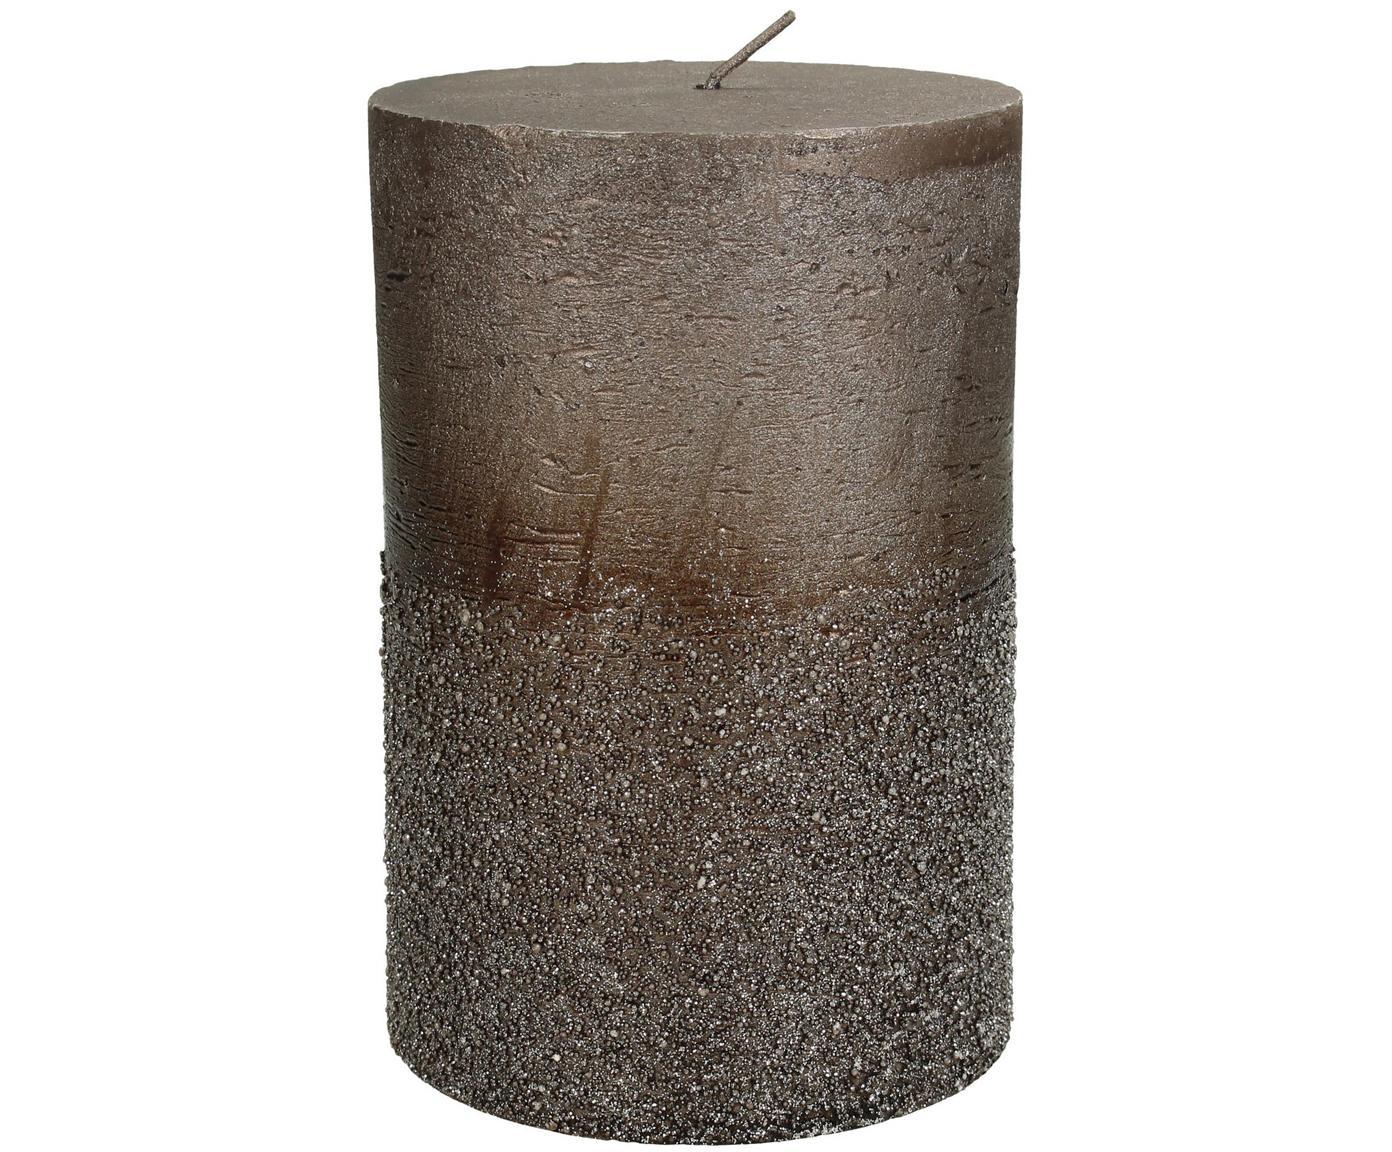 Stompkaars Glitters, Was, Bruin, Ø 10 cm